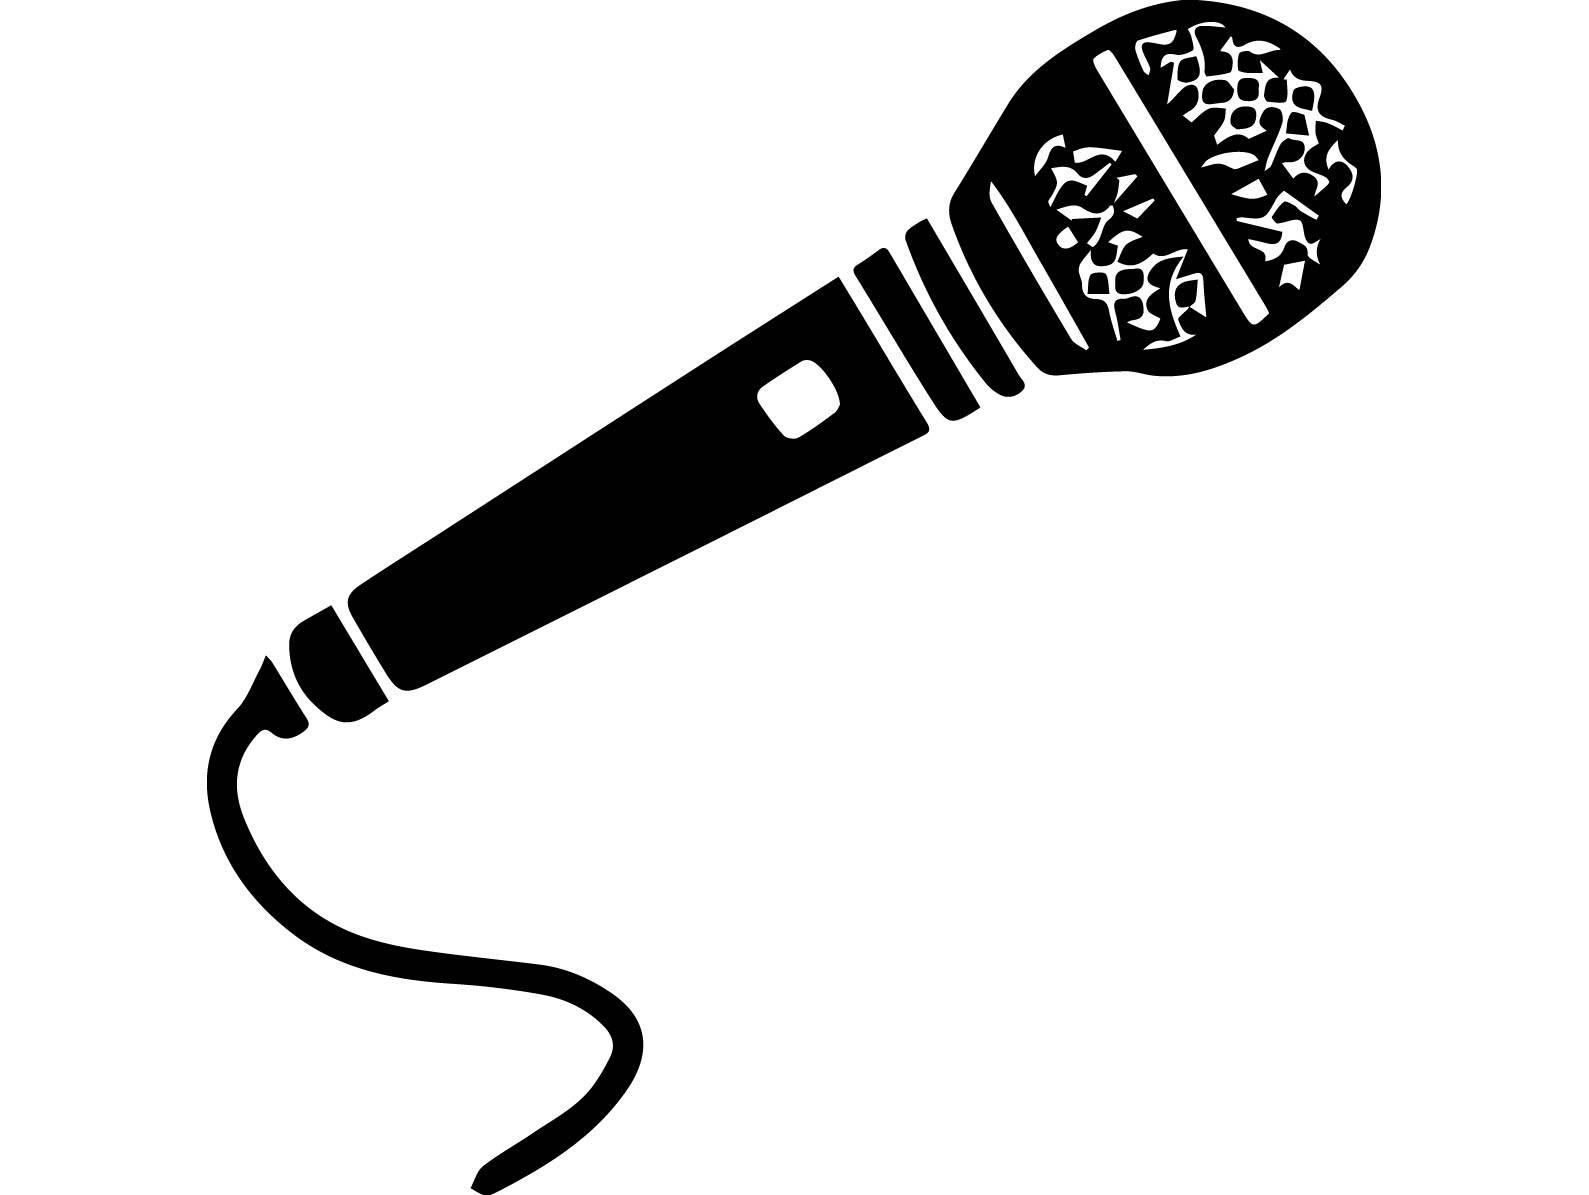 1589x1195 Microphone Singer Audio Voice Karaoke Record Concert Radio Etsy